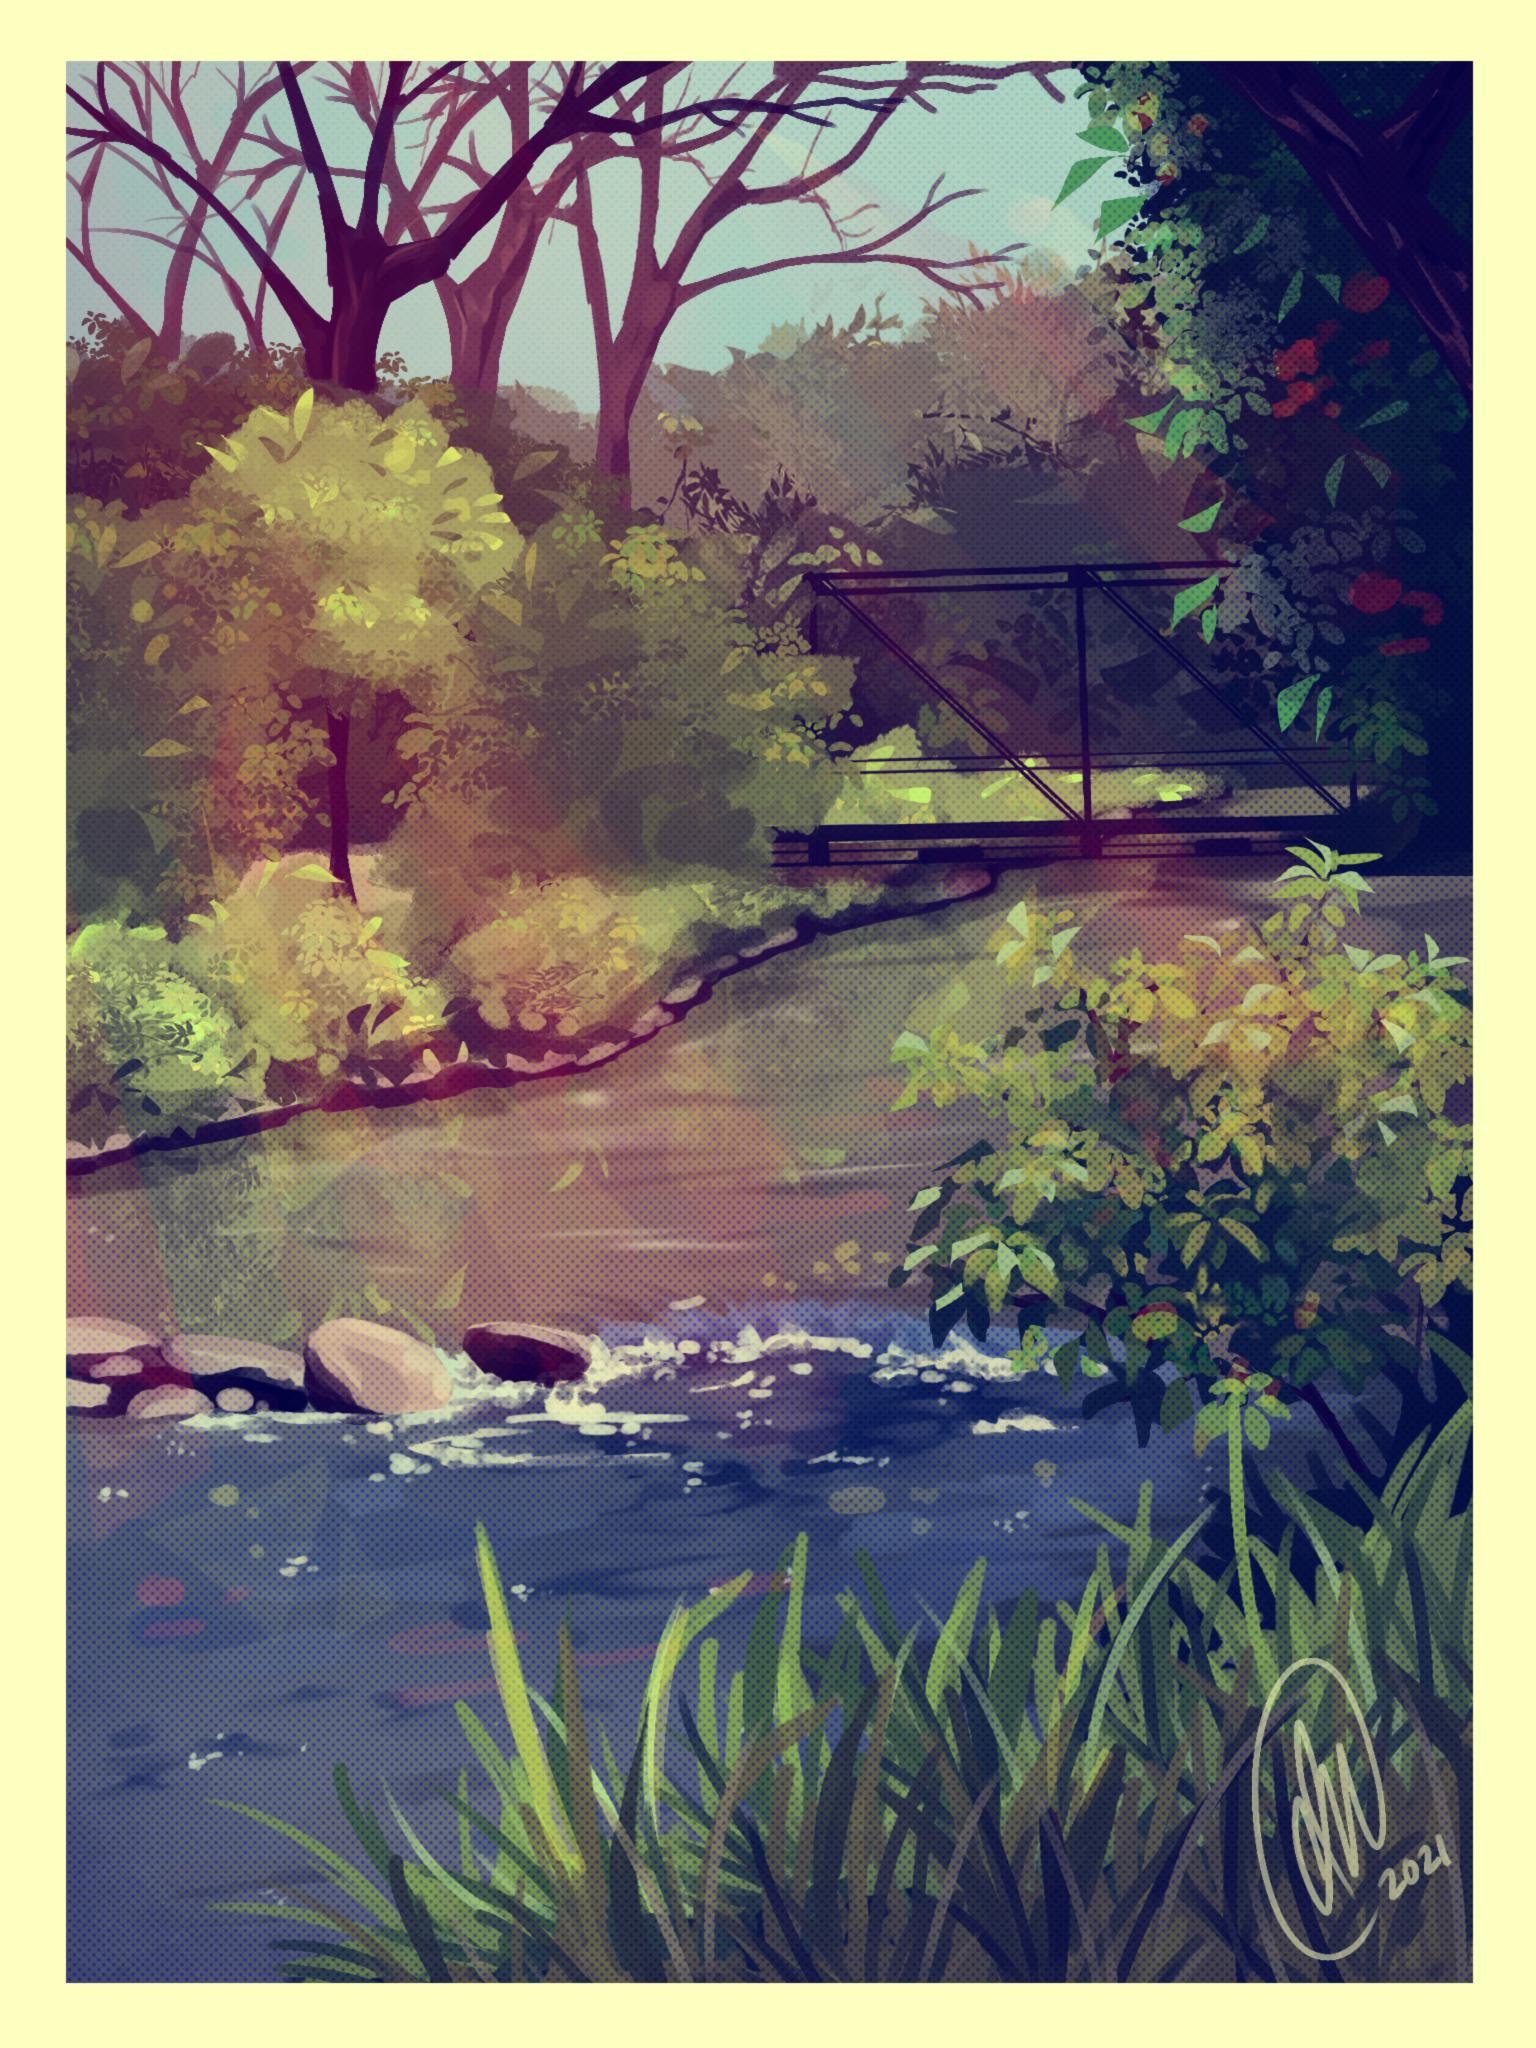 Digital painting of bridge and water